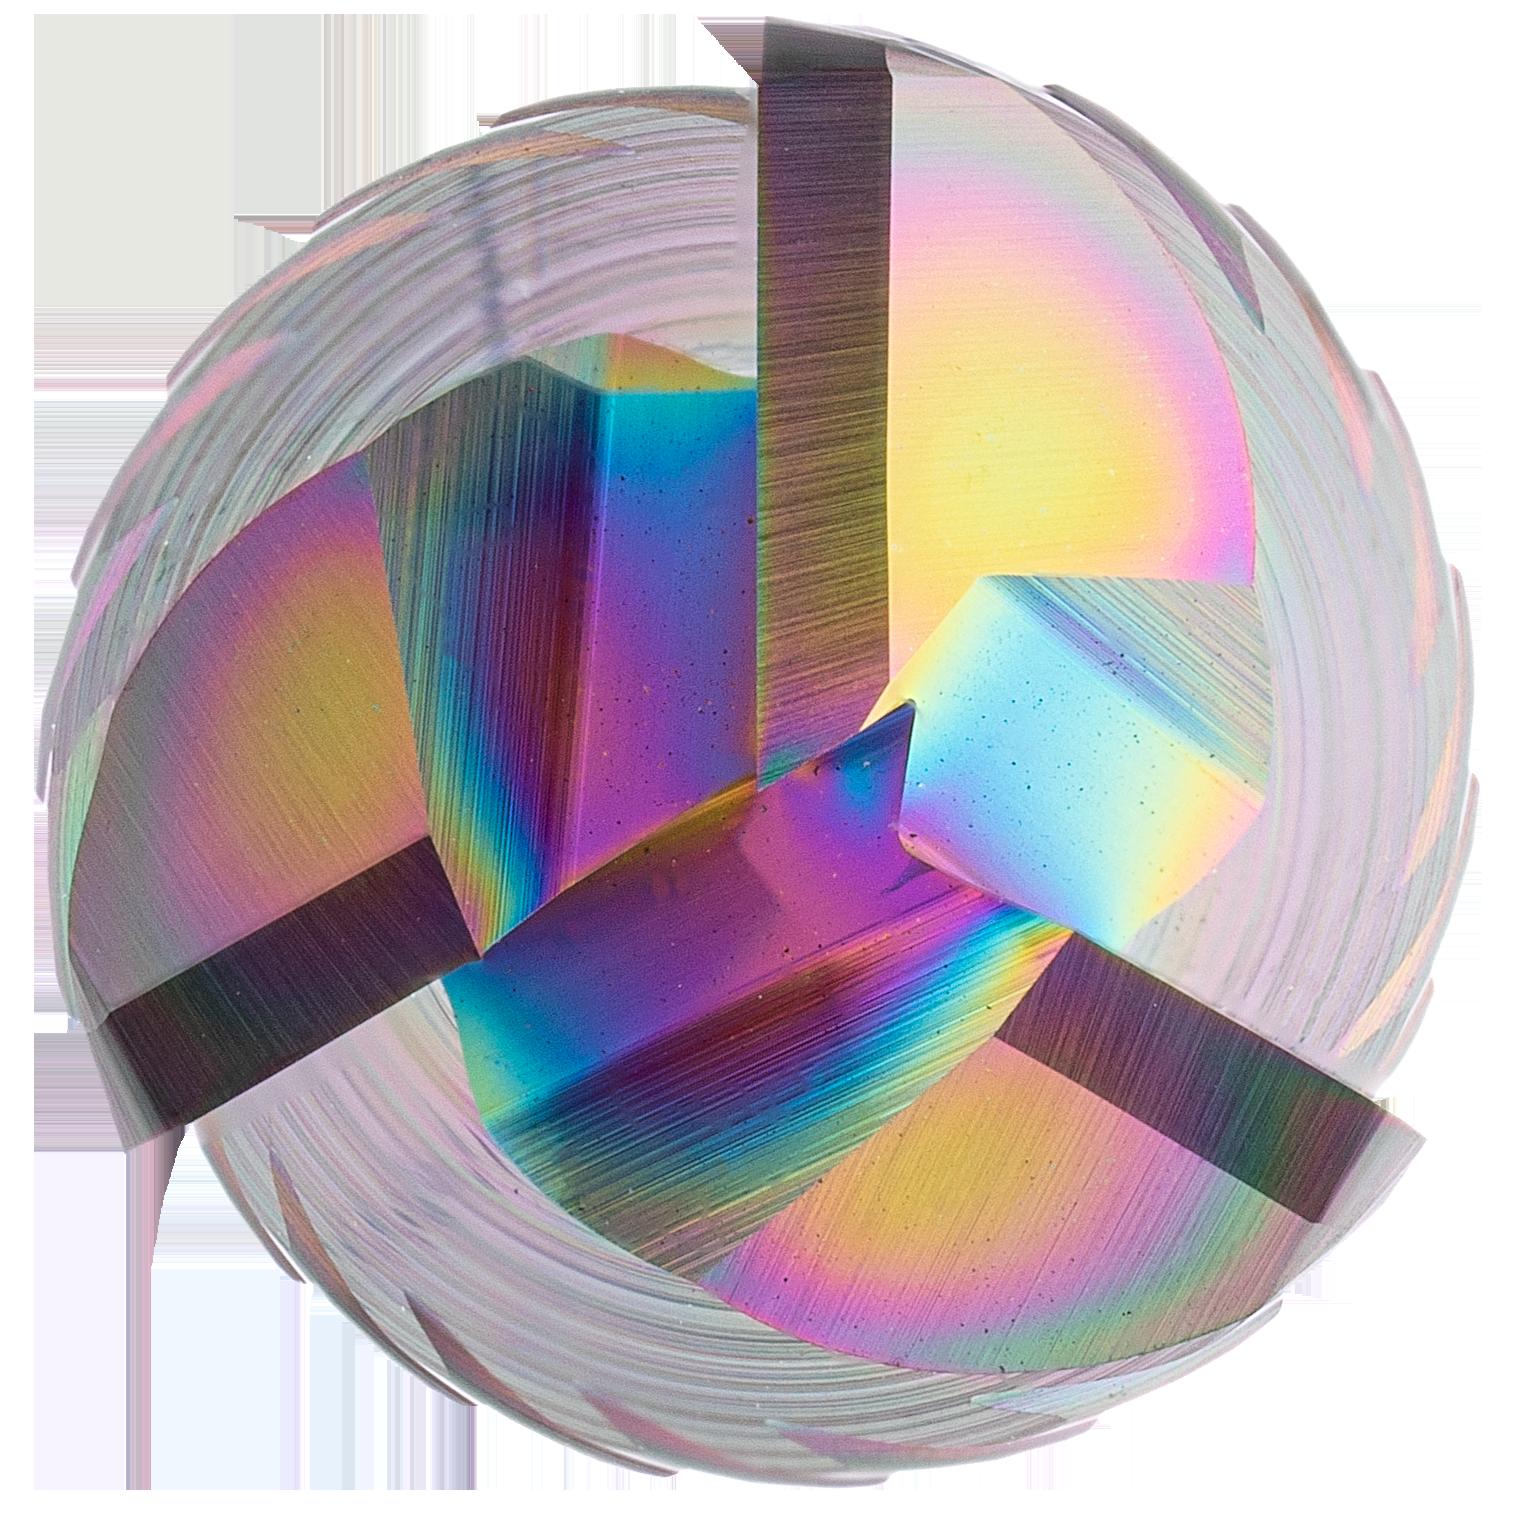 EXN1-M02-0053